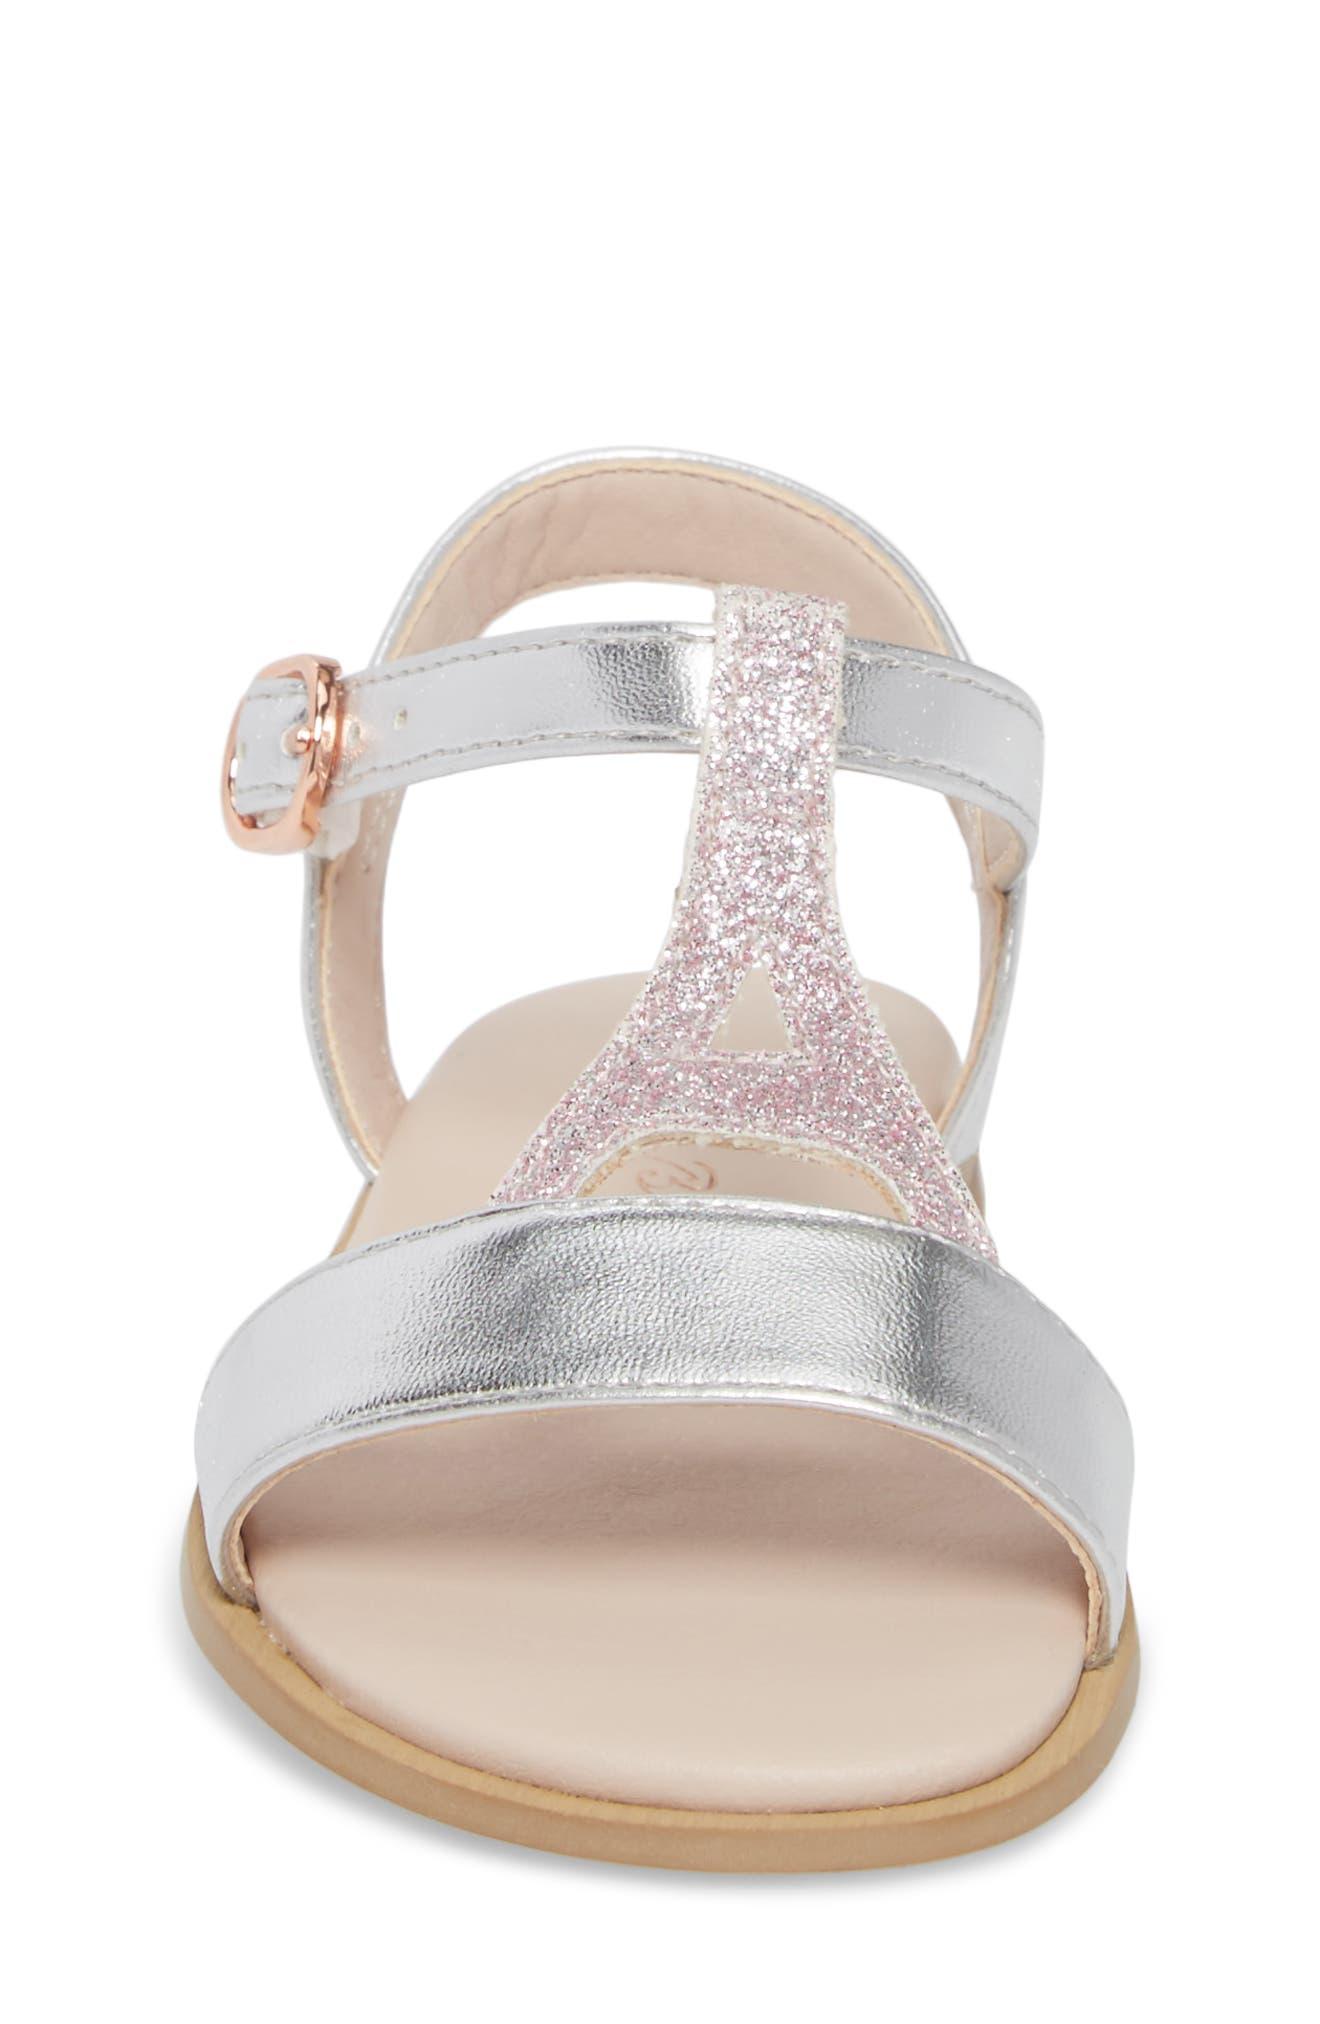 Tegan Glitter T-Strap Sandal,                             Alternate thumbnail 4, color,                             040